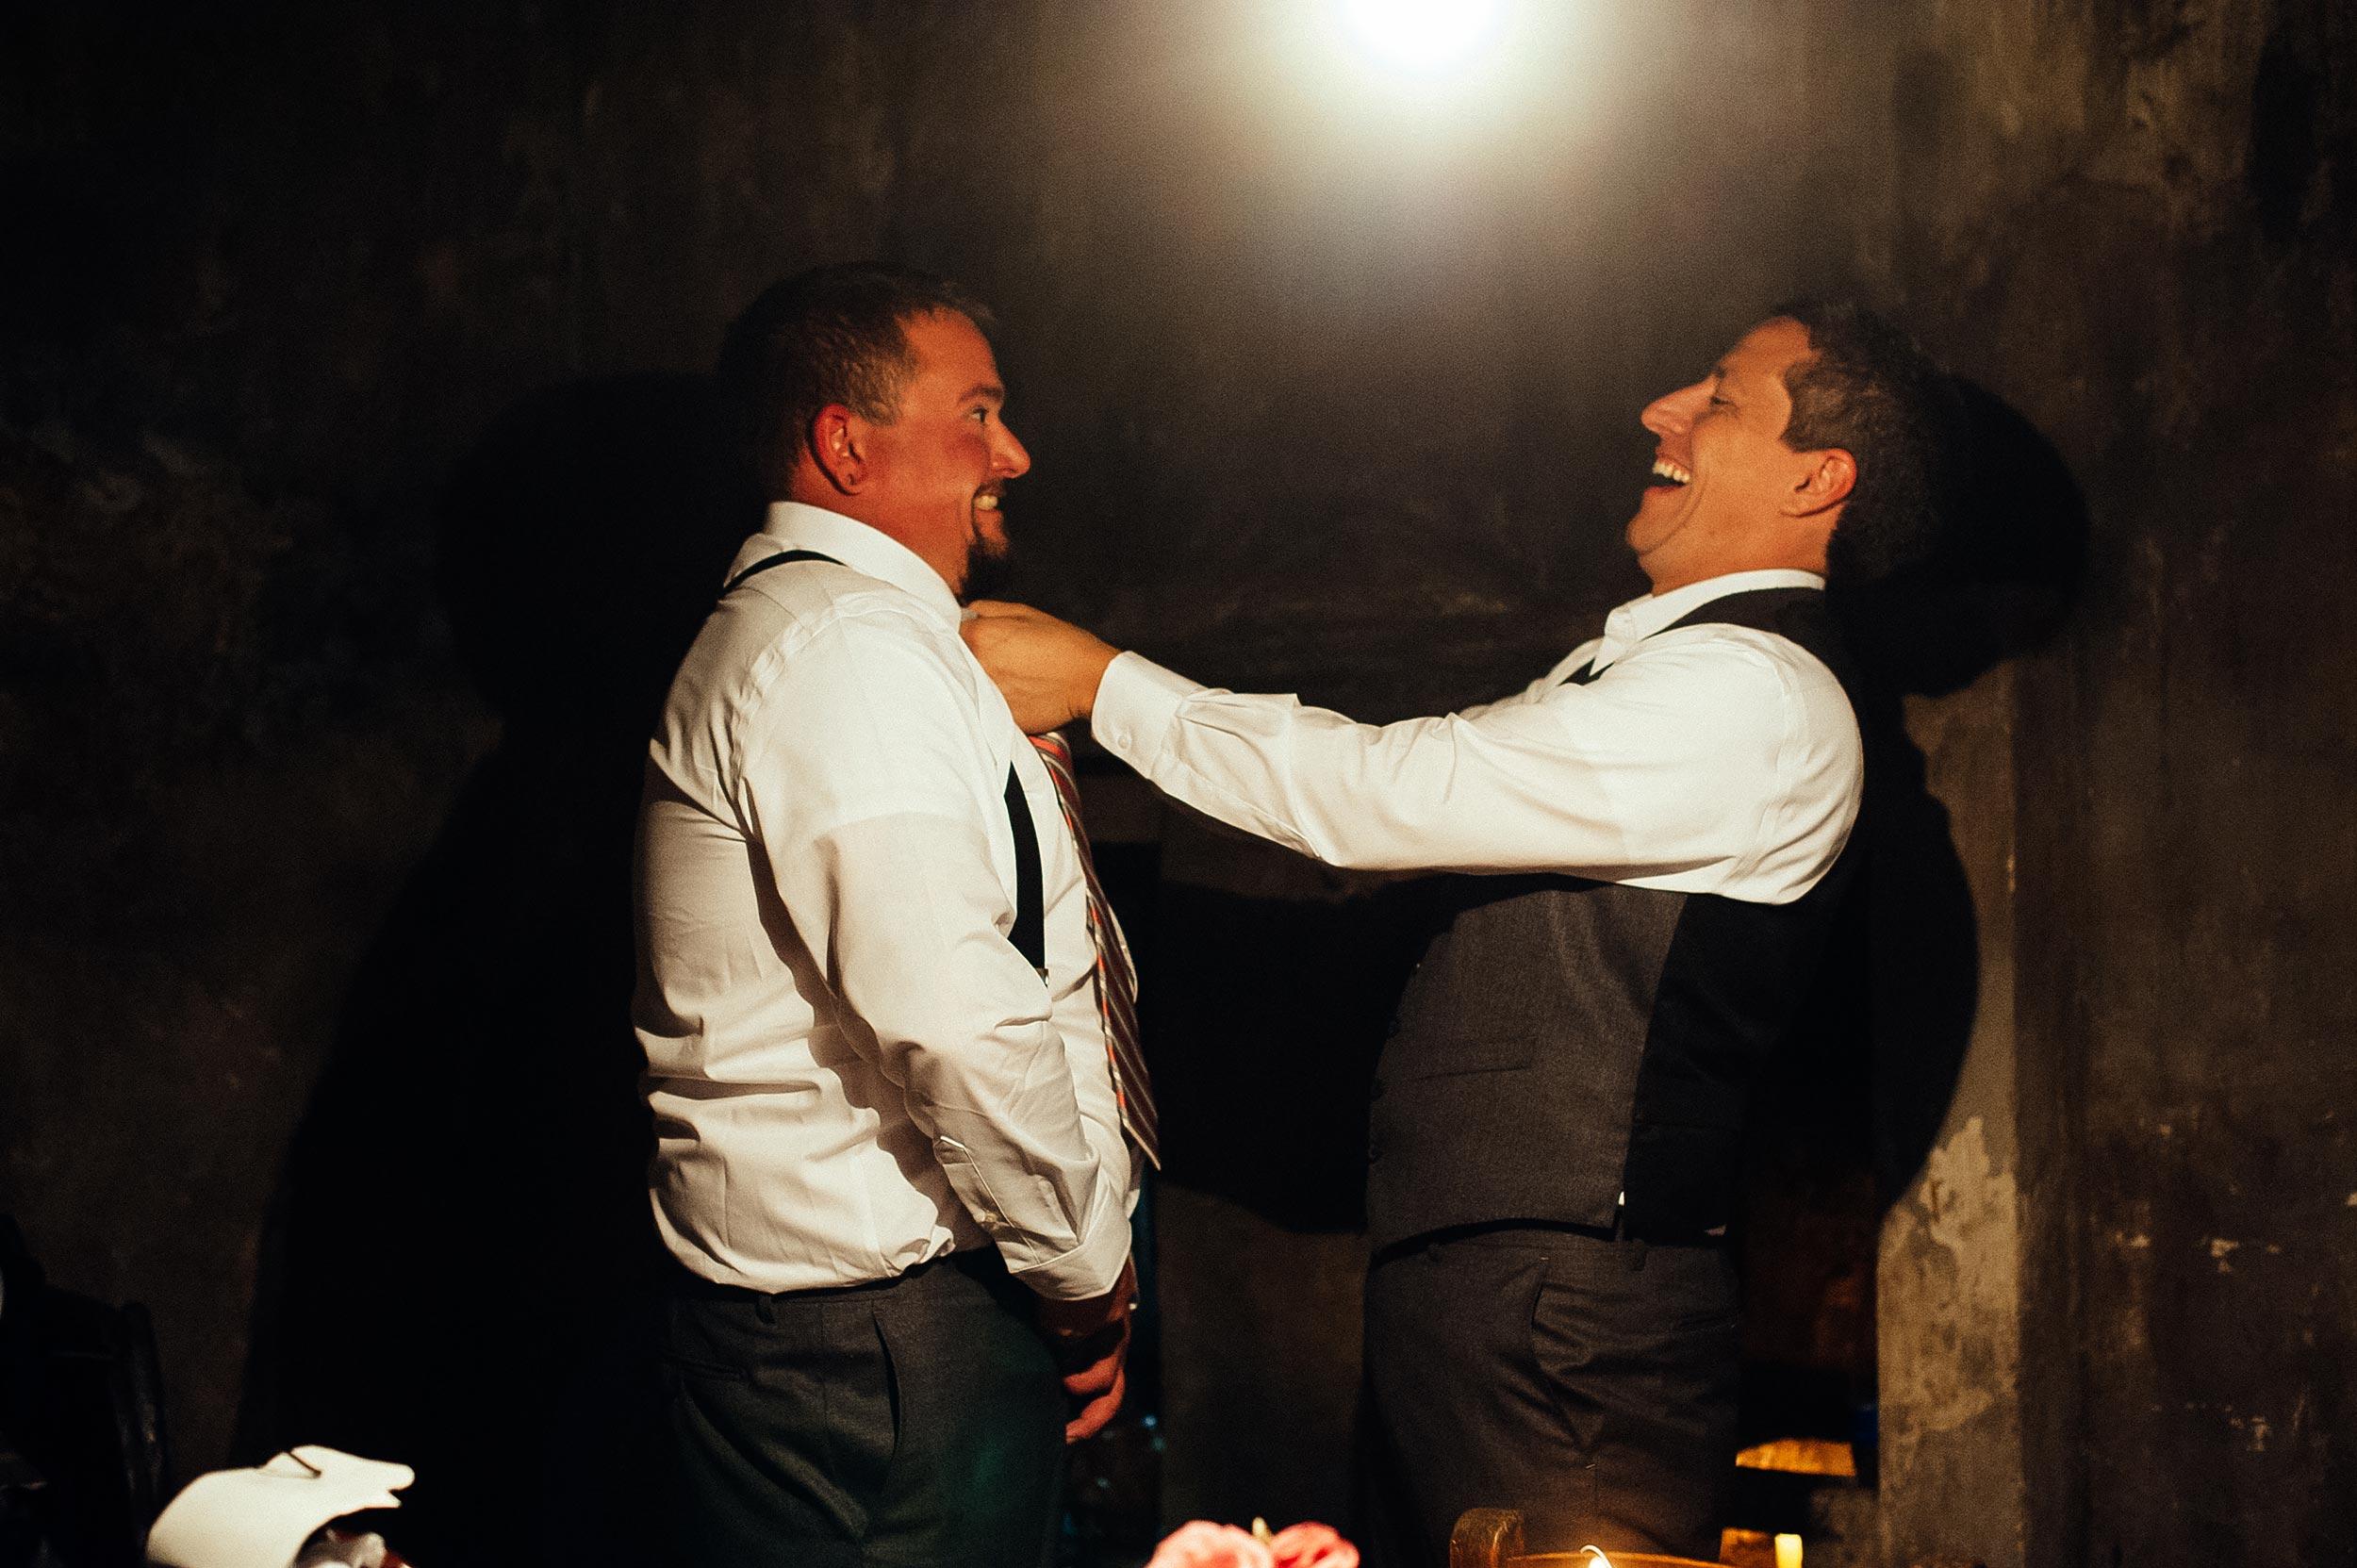 2014-Shelby-Jocelyn-Santo-Stefano-Di-Sessanio-Wedding-Photographer-Italy-Alessandro-Avenali-13.jpg